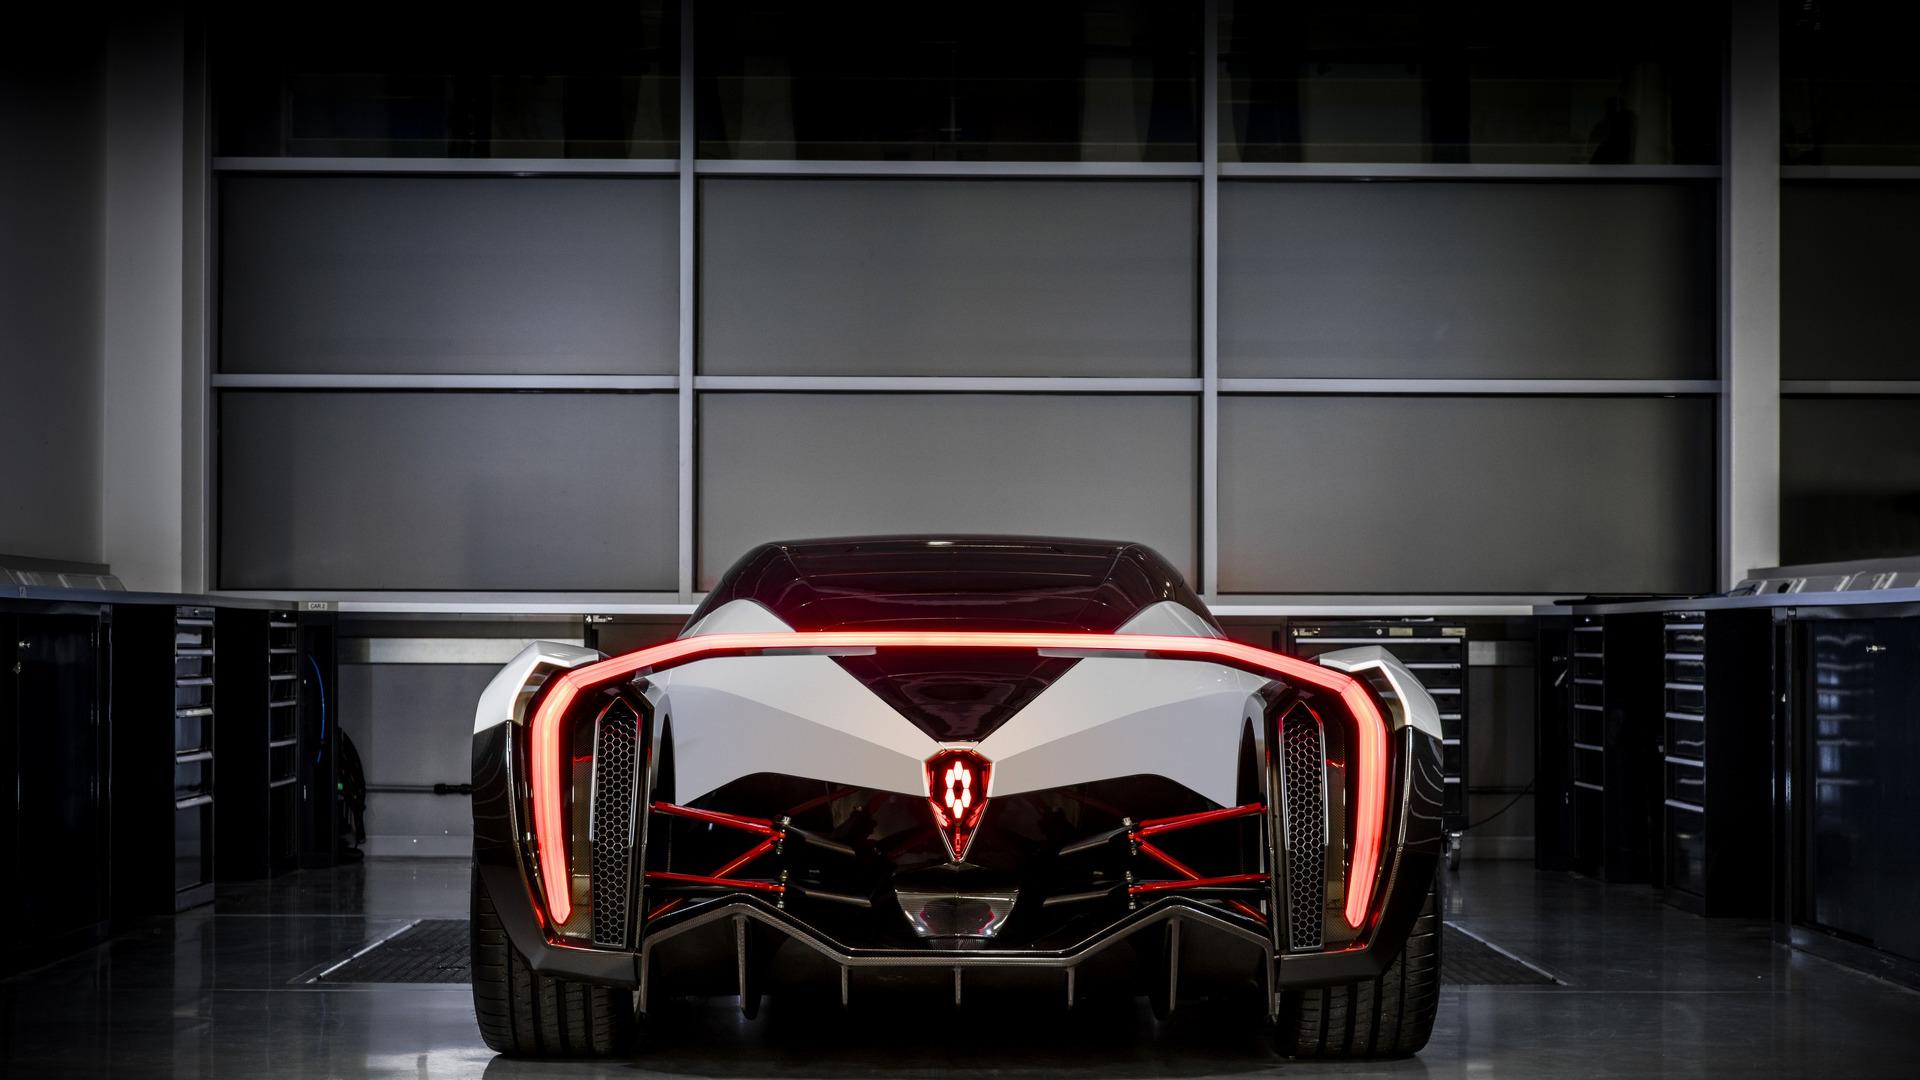 vanda-electrics-dendrobium-concept (5)